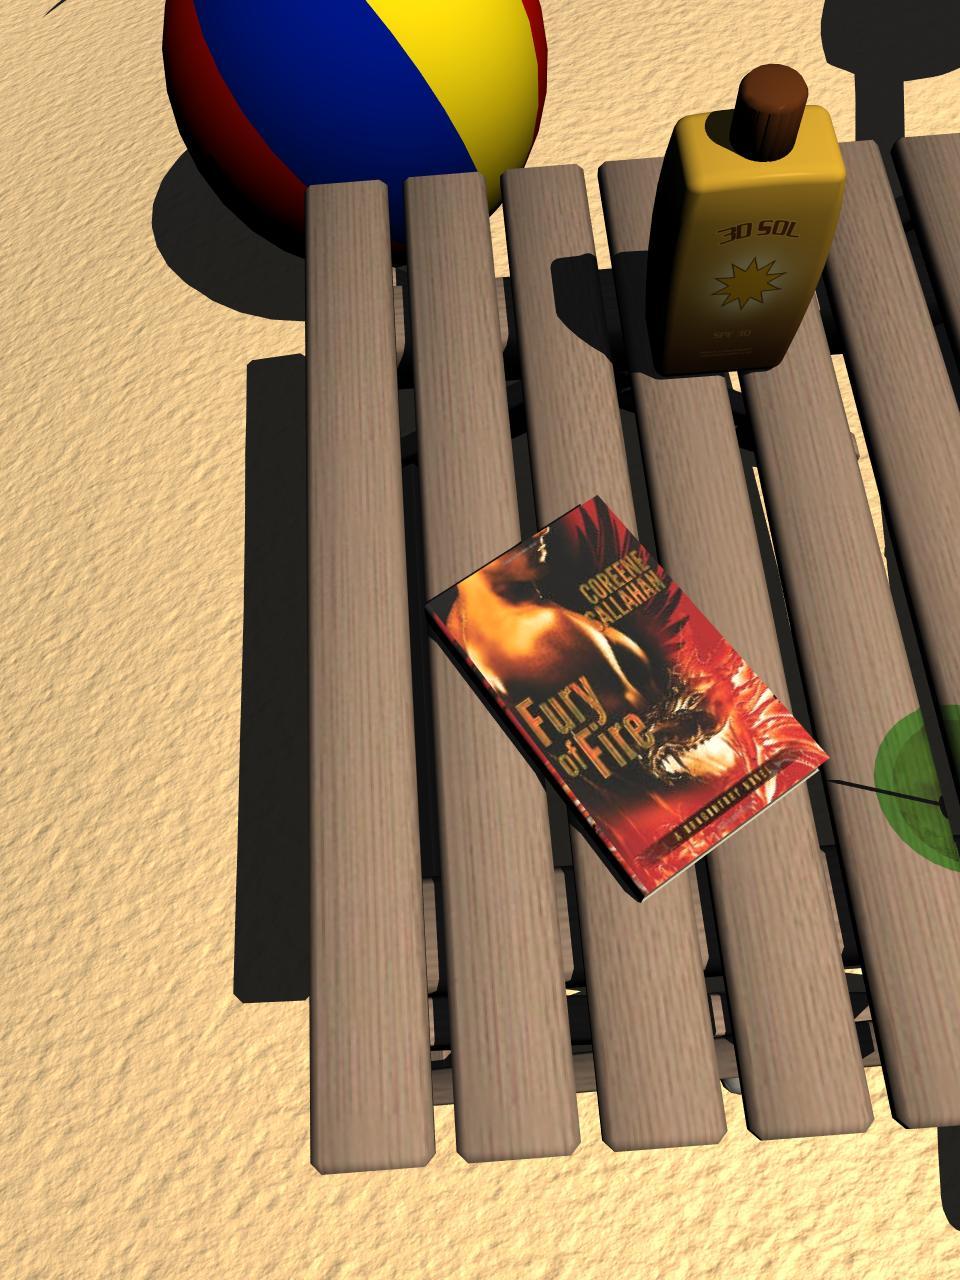 Fury of Fire (Dragonfury Book1)